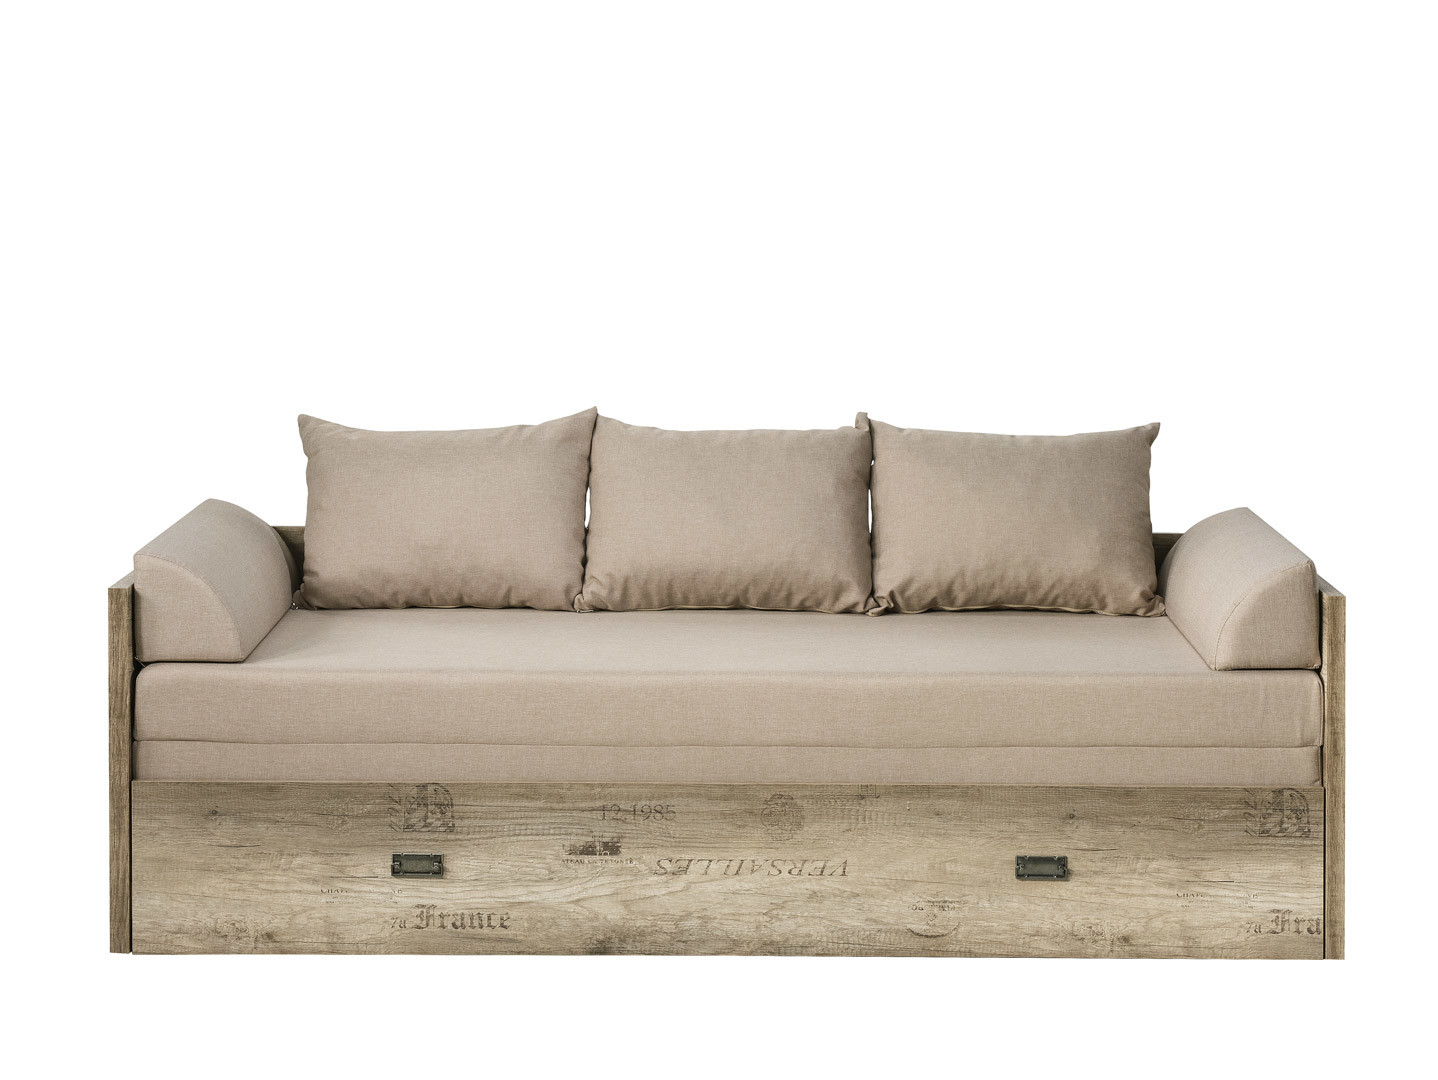 Rozkládací postel 80 až 160 cm - BRW - Malcolm - LOZ/80/160 (s roštem)